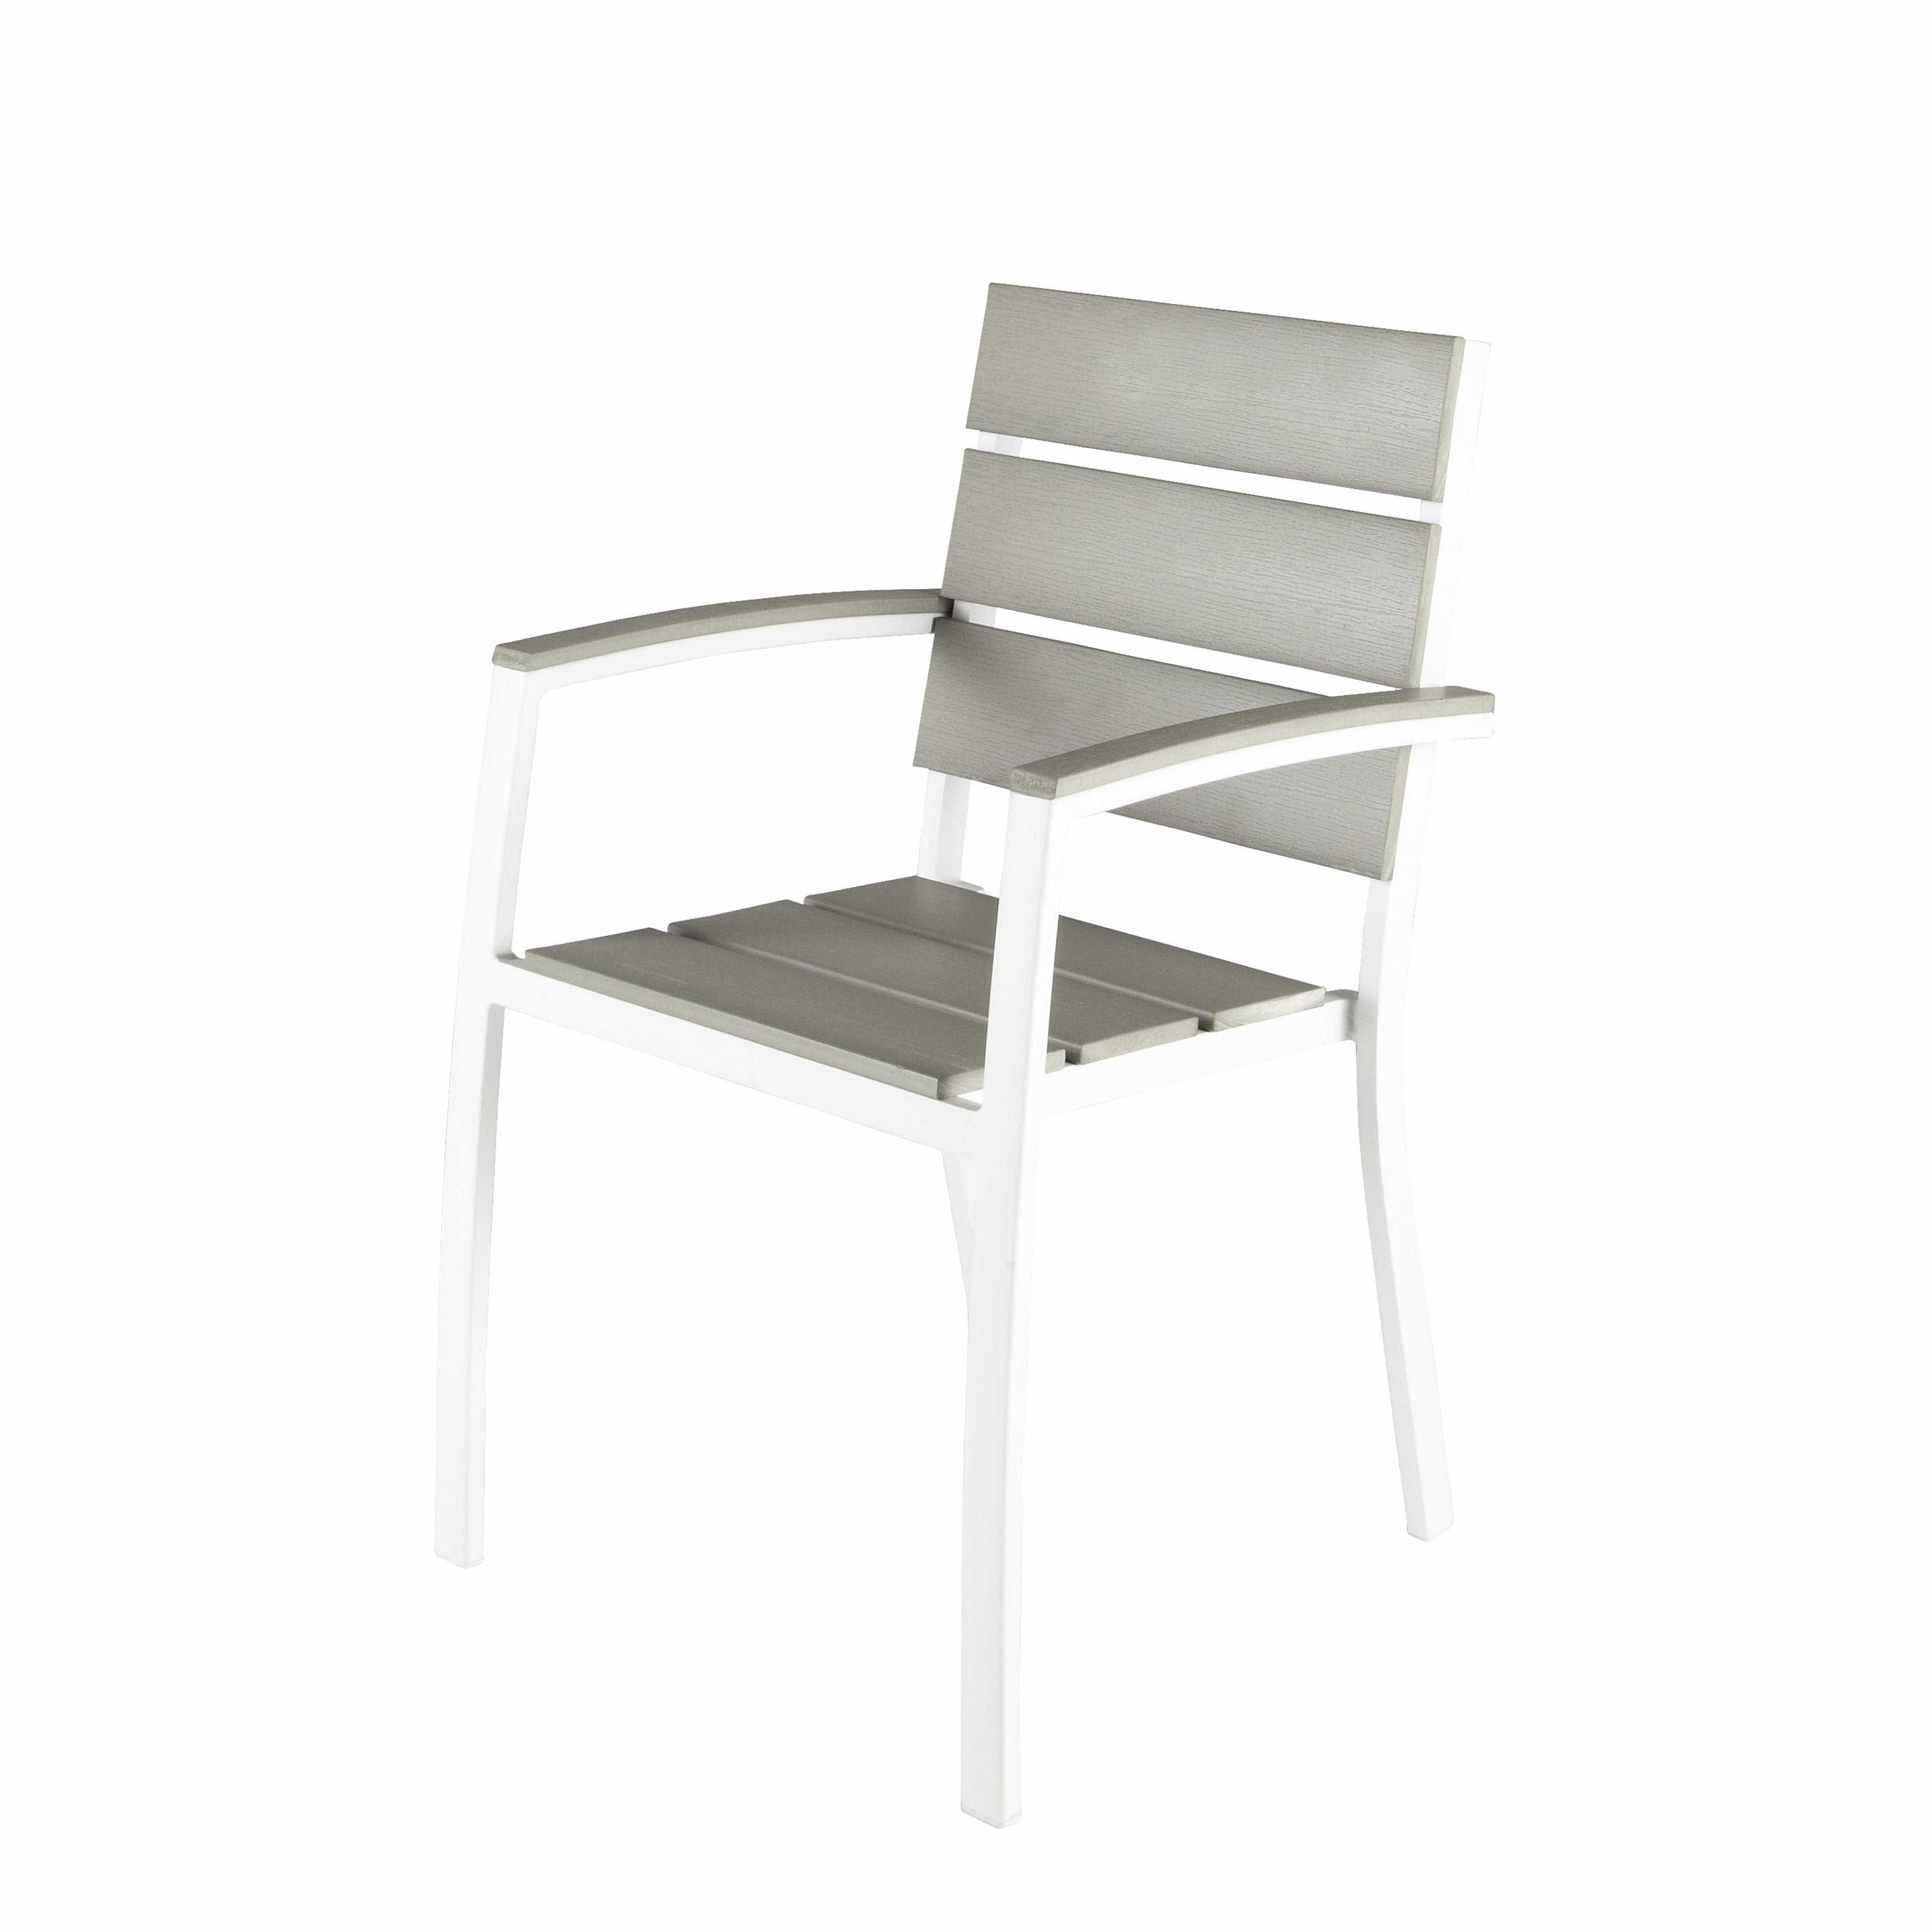 holz gartenmobel pflegen minimalist. Black Bedroom Furniture Sets. Home Design Ideas